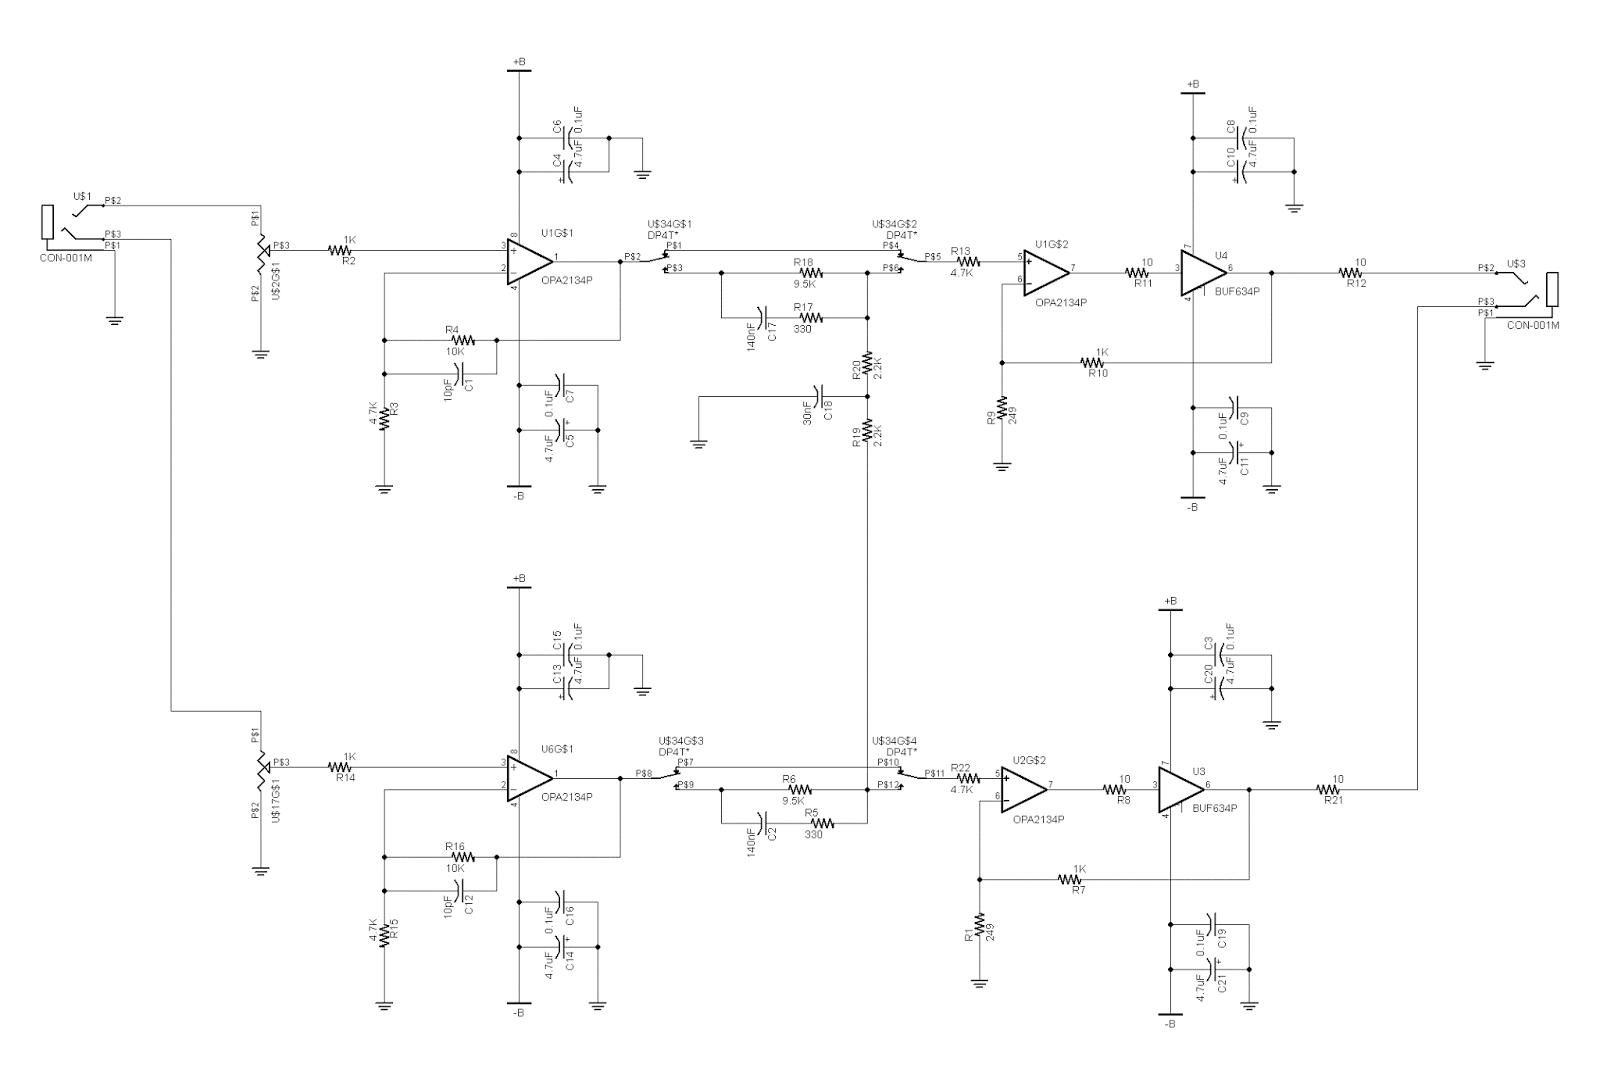 Burr Brown Amp Schematic House Wiring Diagram Symbols Op Headphone Tony S Electronics Projects Rh Af6ea Blogspot Com Crate Schematics Bass